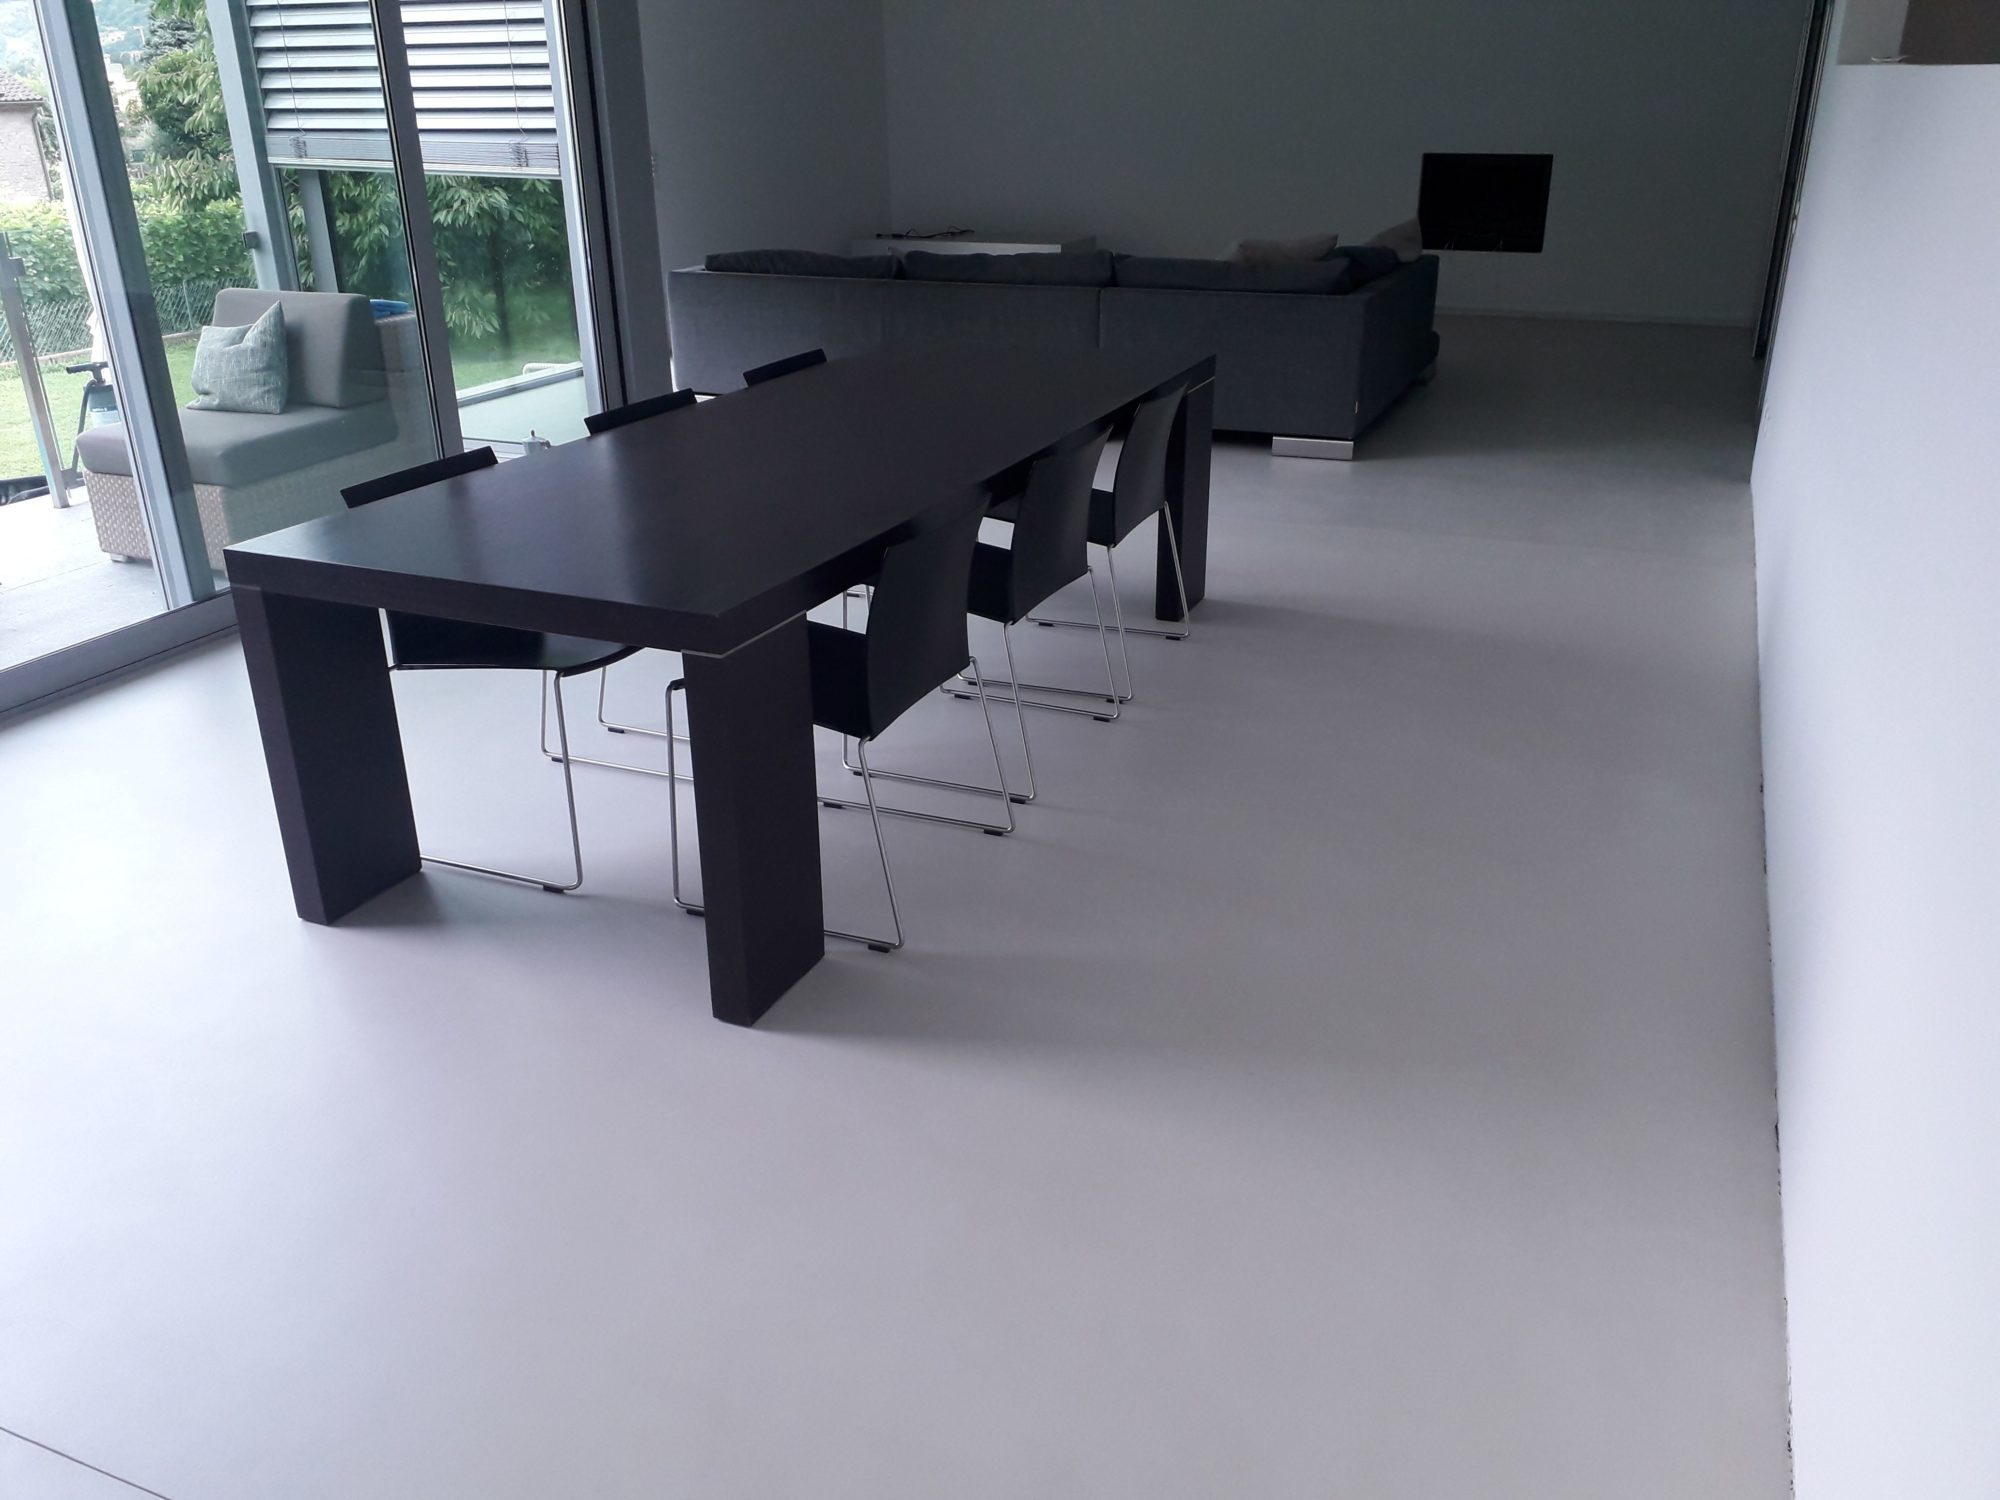 sol salle a manger et sol cuisine maison priv e giubiasco tessin suisse 1 compressor. Black Bedroom Furniture Sets. Home Design Ideas